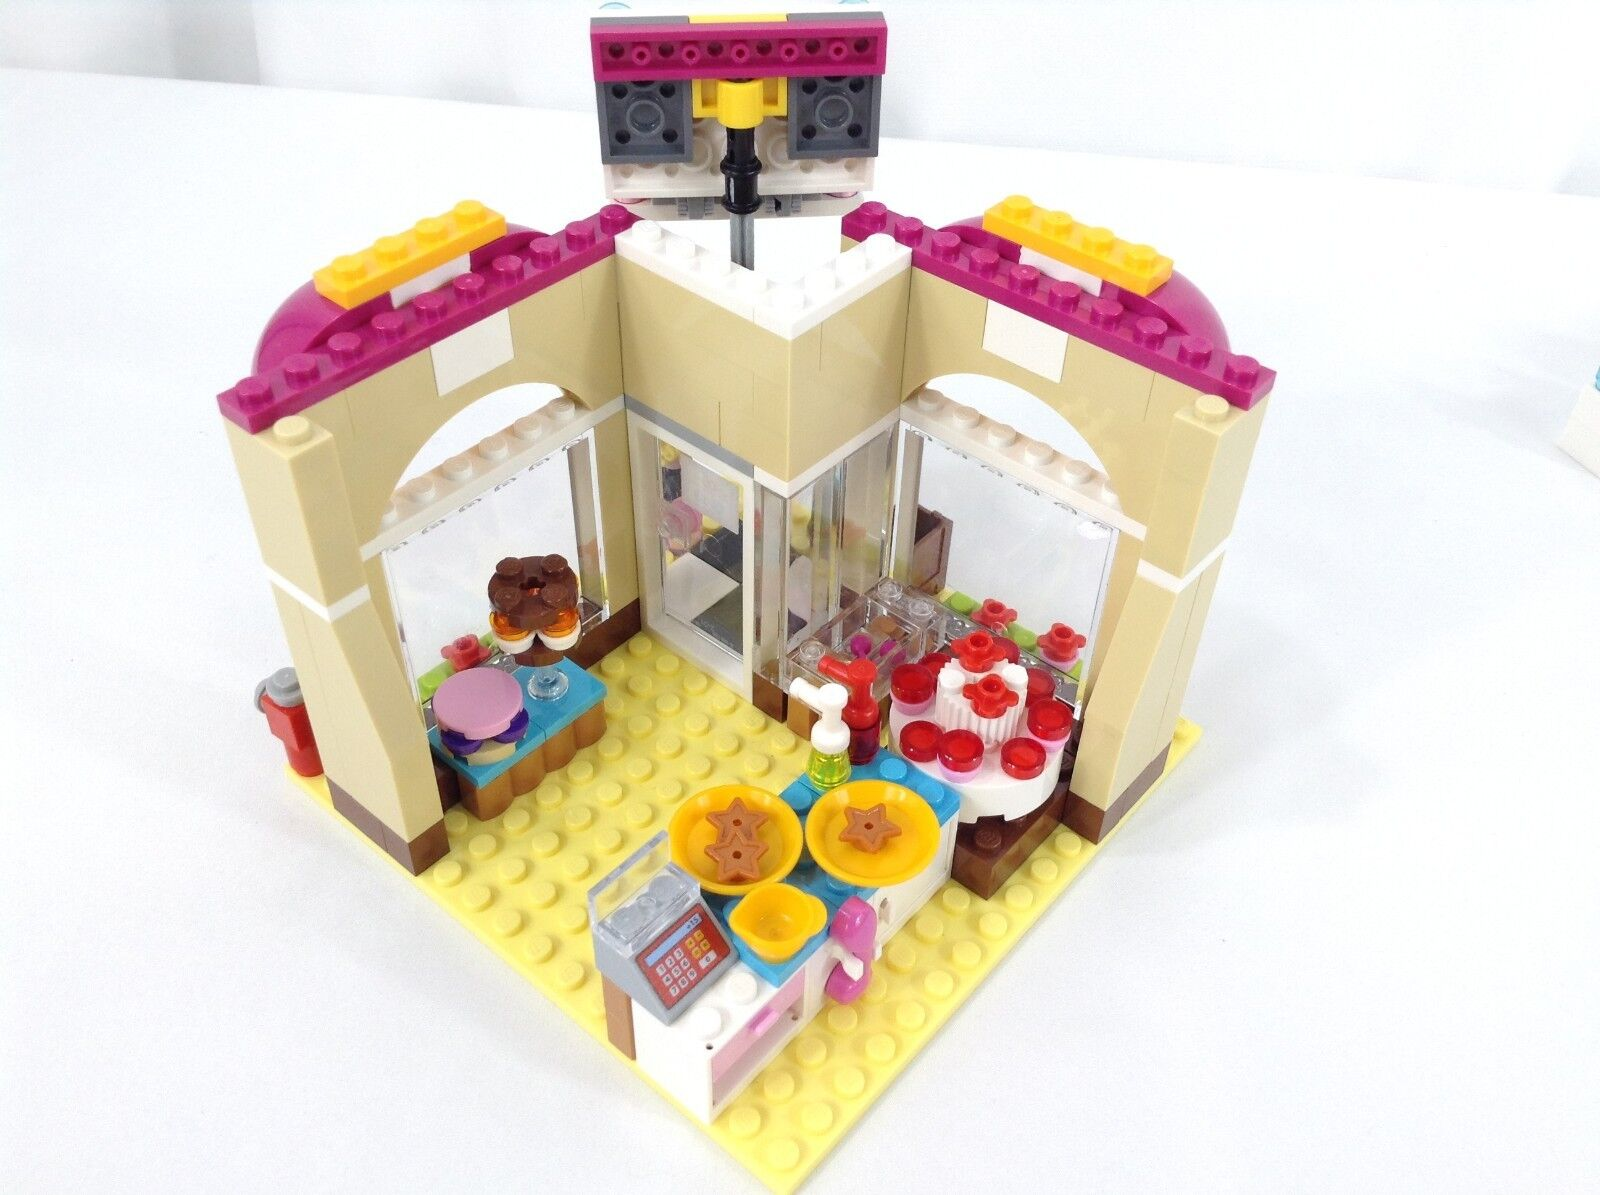 Lego Friends 41006 Bakery, 30106 Stand, 3930 Bakery Bakery Bakery Lot 98% Complete 41793e